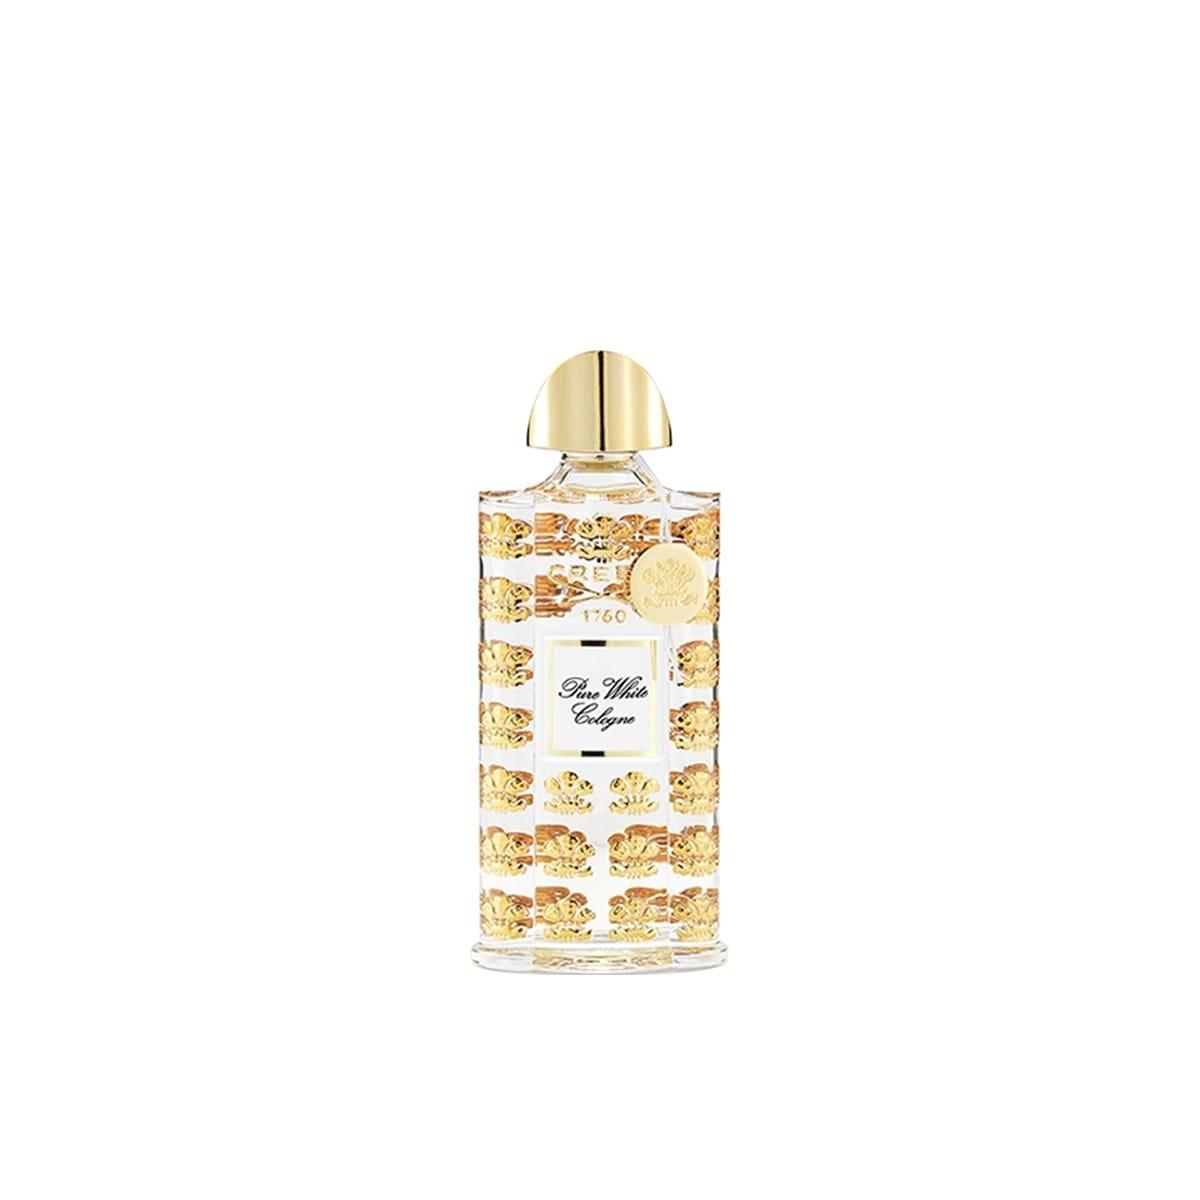 Cologne White Parfum Pure De Eau Yg6yvbf7